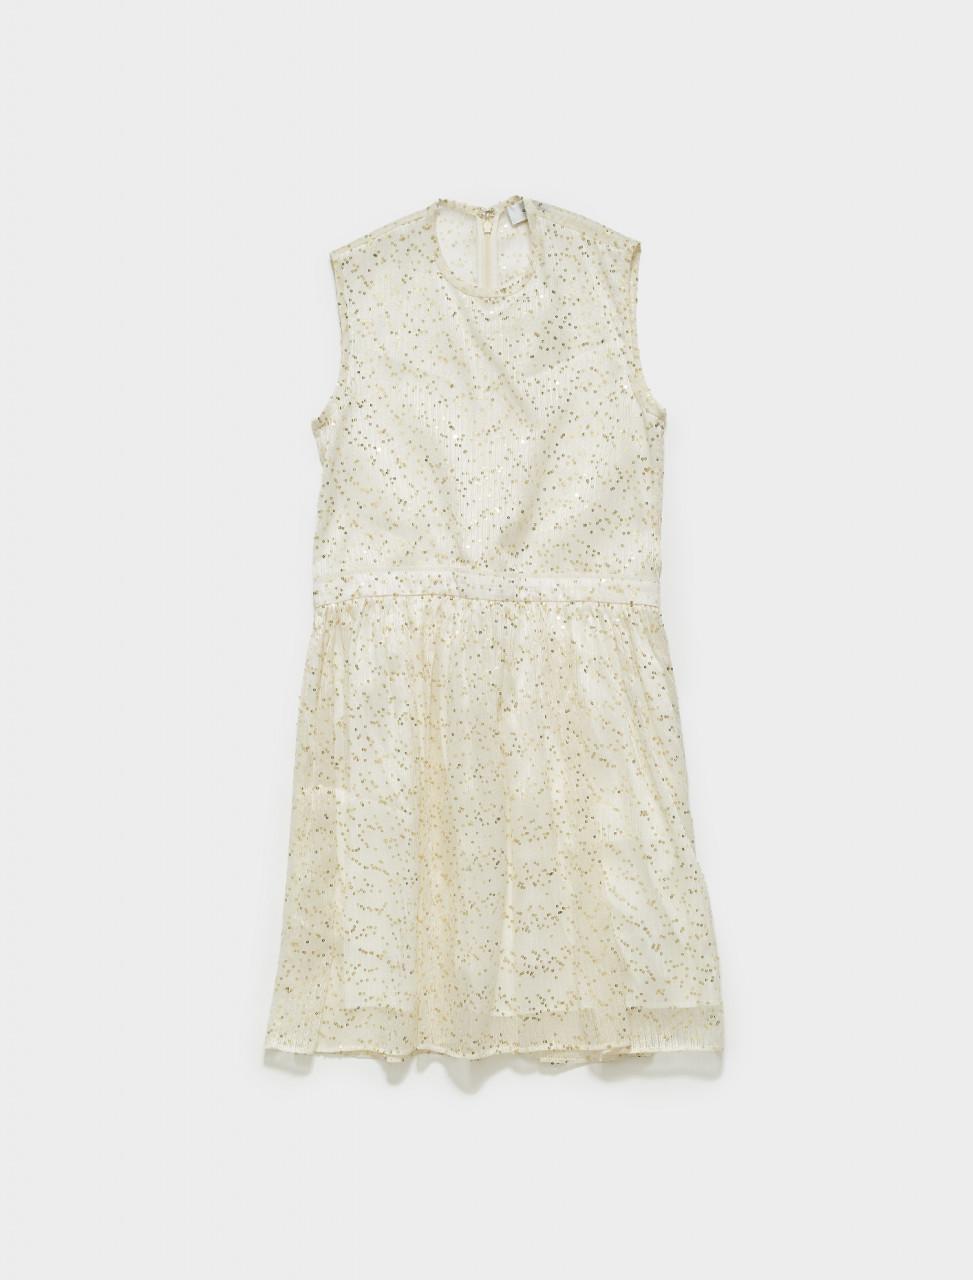 116-3048R56-000 CARVEN BABY DOLL DRESS WHITE